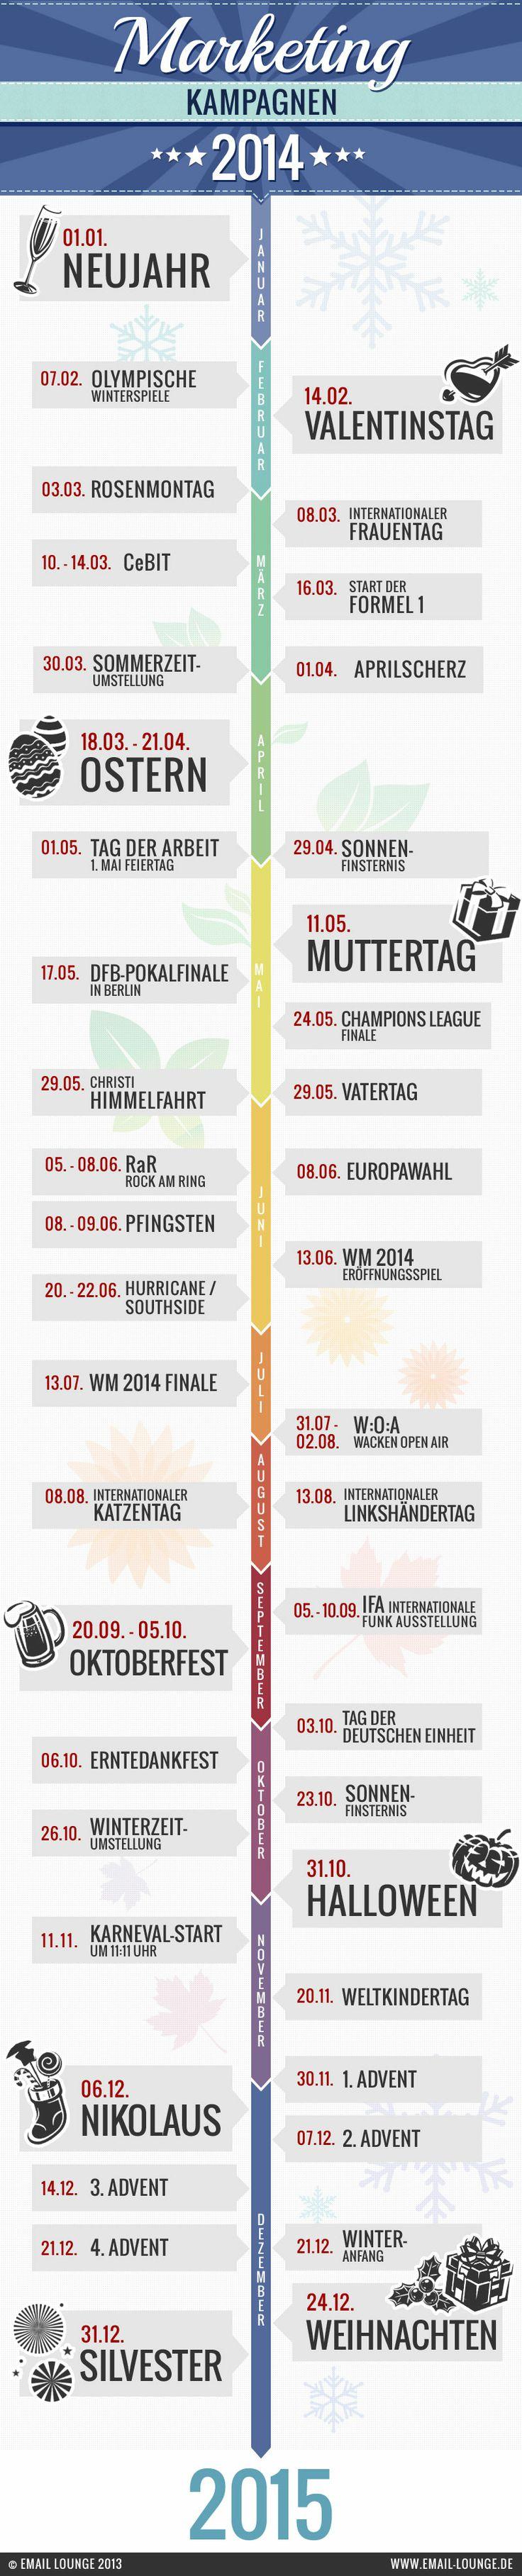 Marketing Kampagnen Kalender 2014